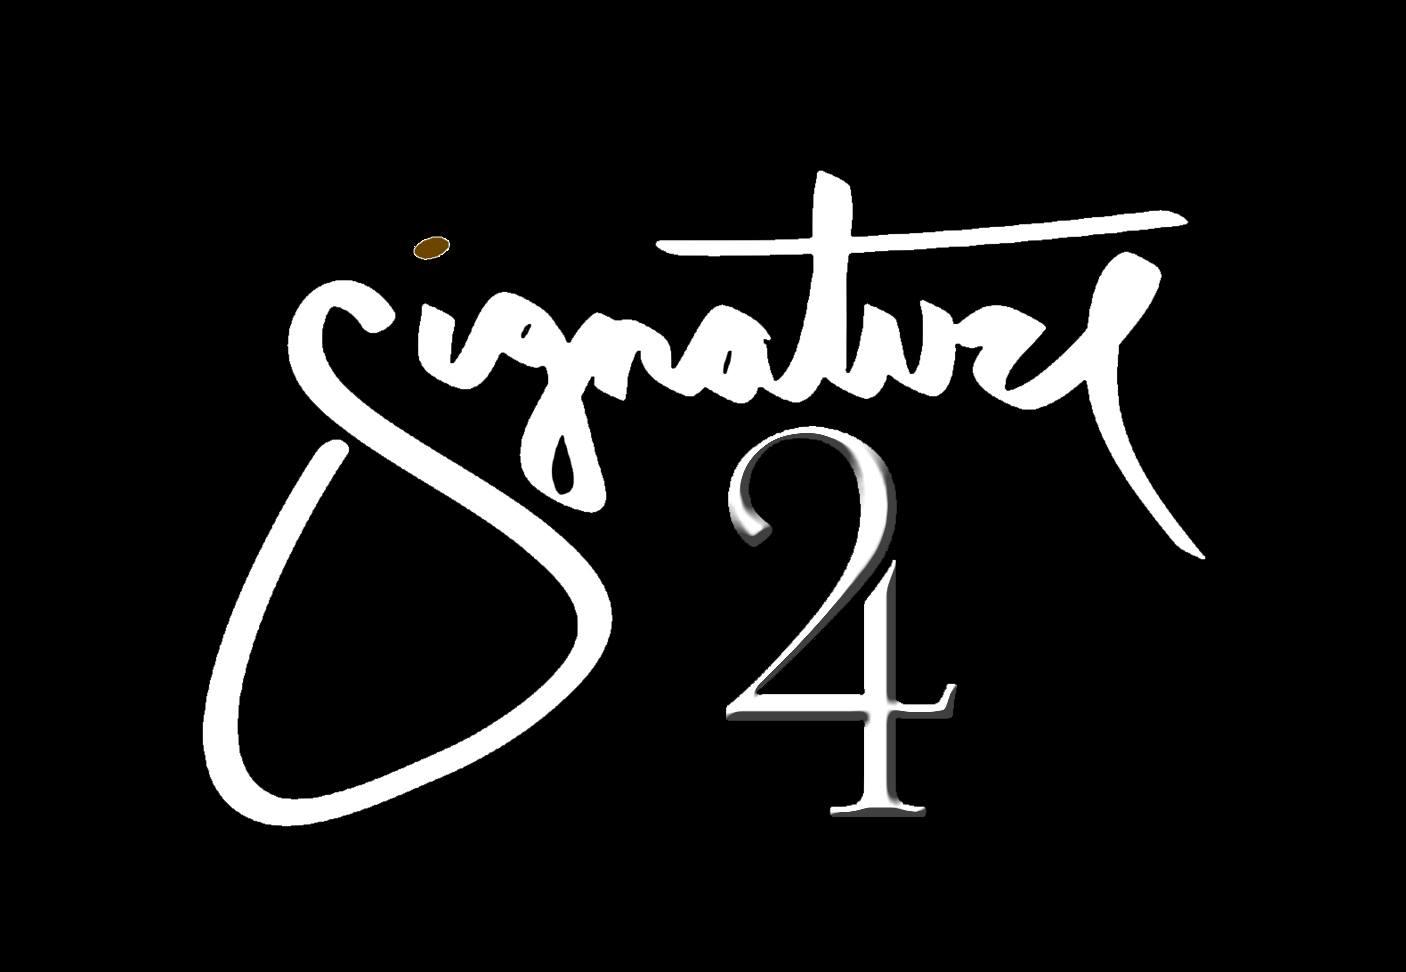 Signature 24 Productions